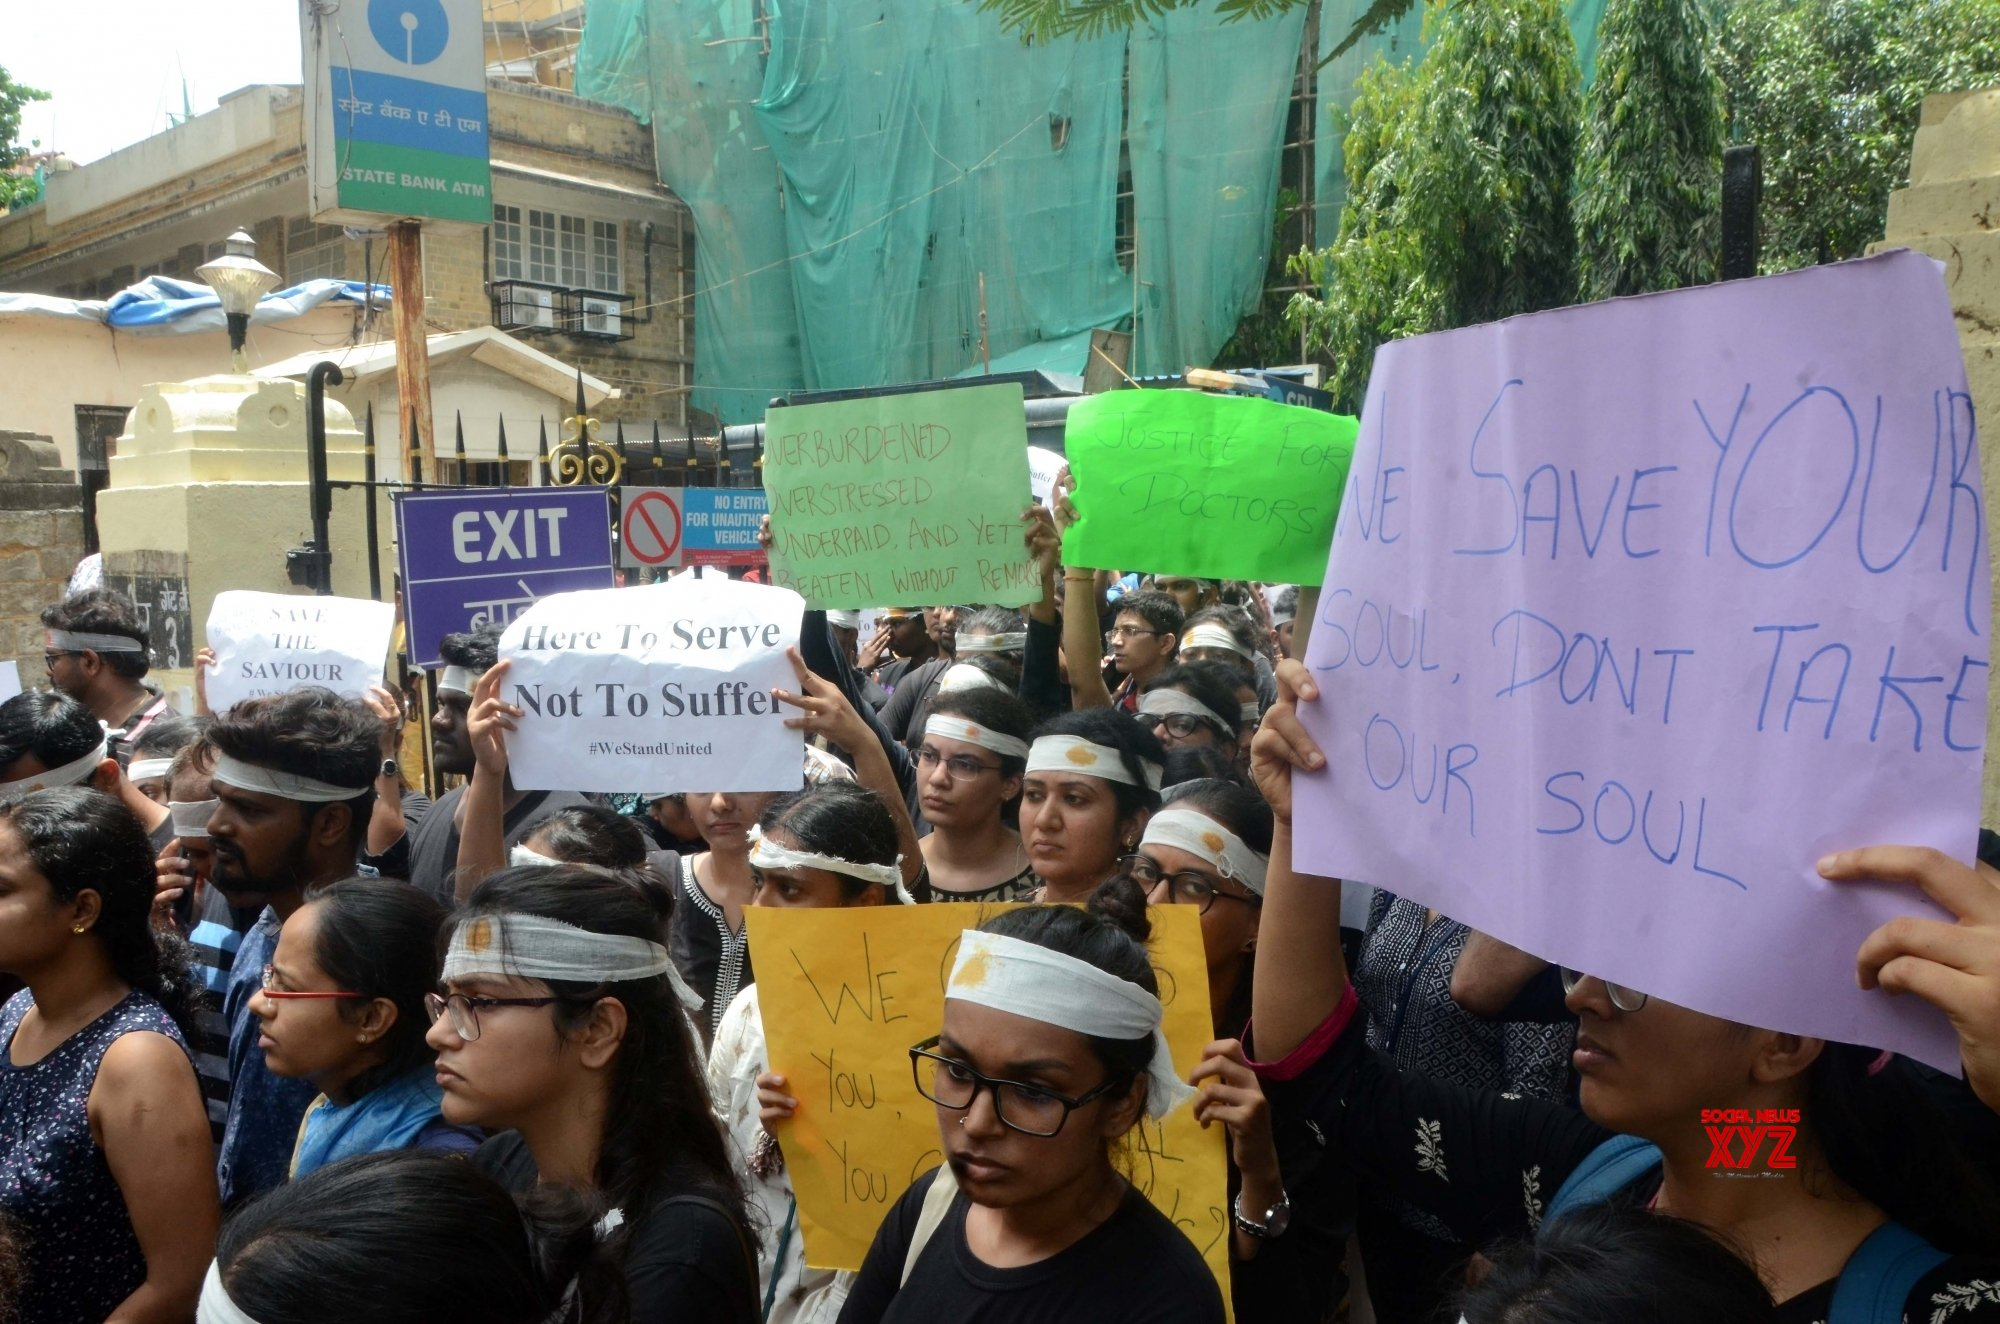 Mumbai: Maharashtra medicos protest against attack on doctors #Gallery